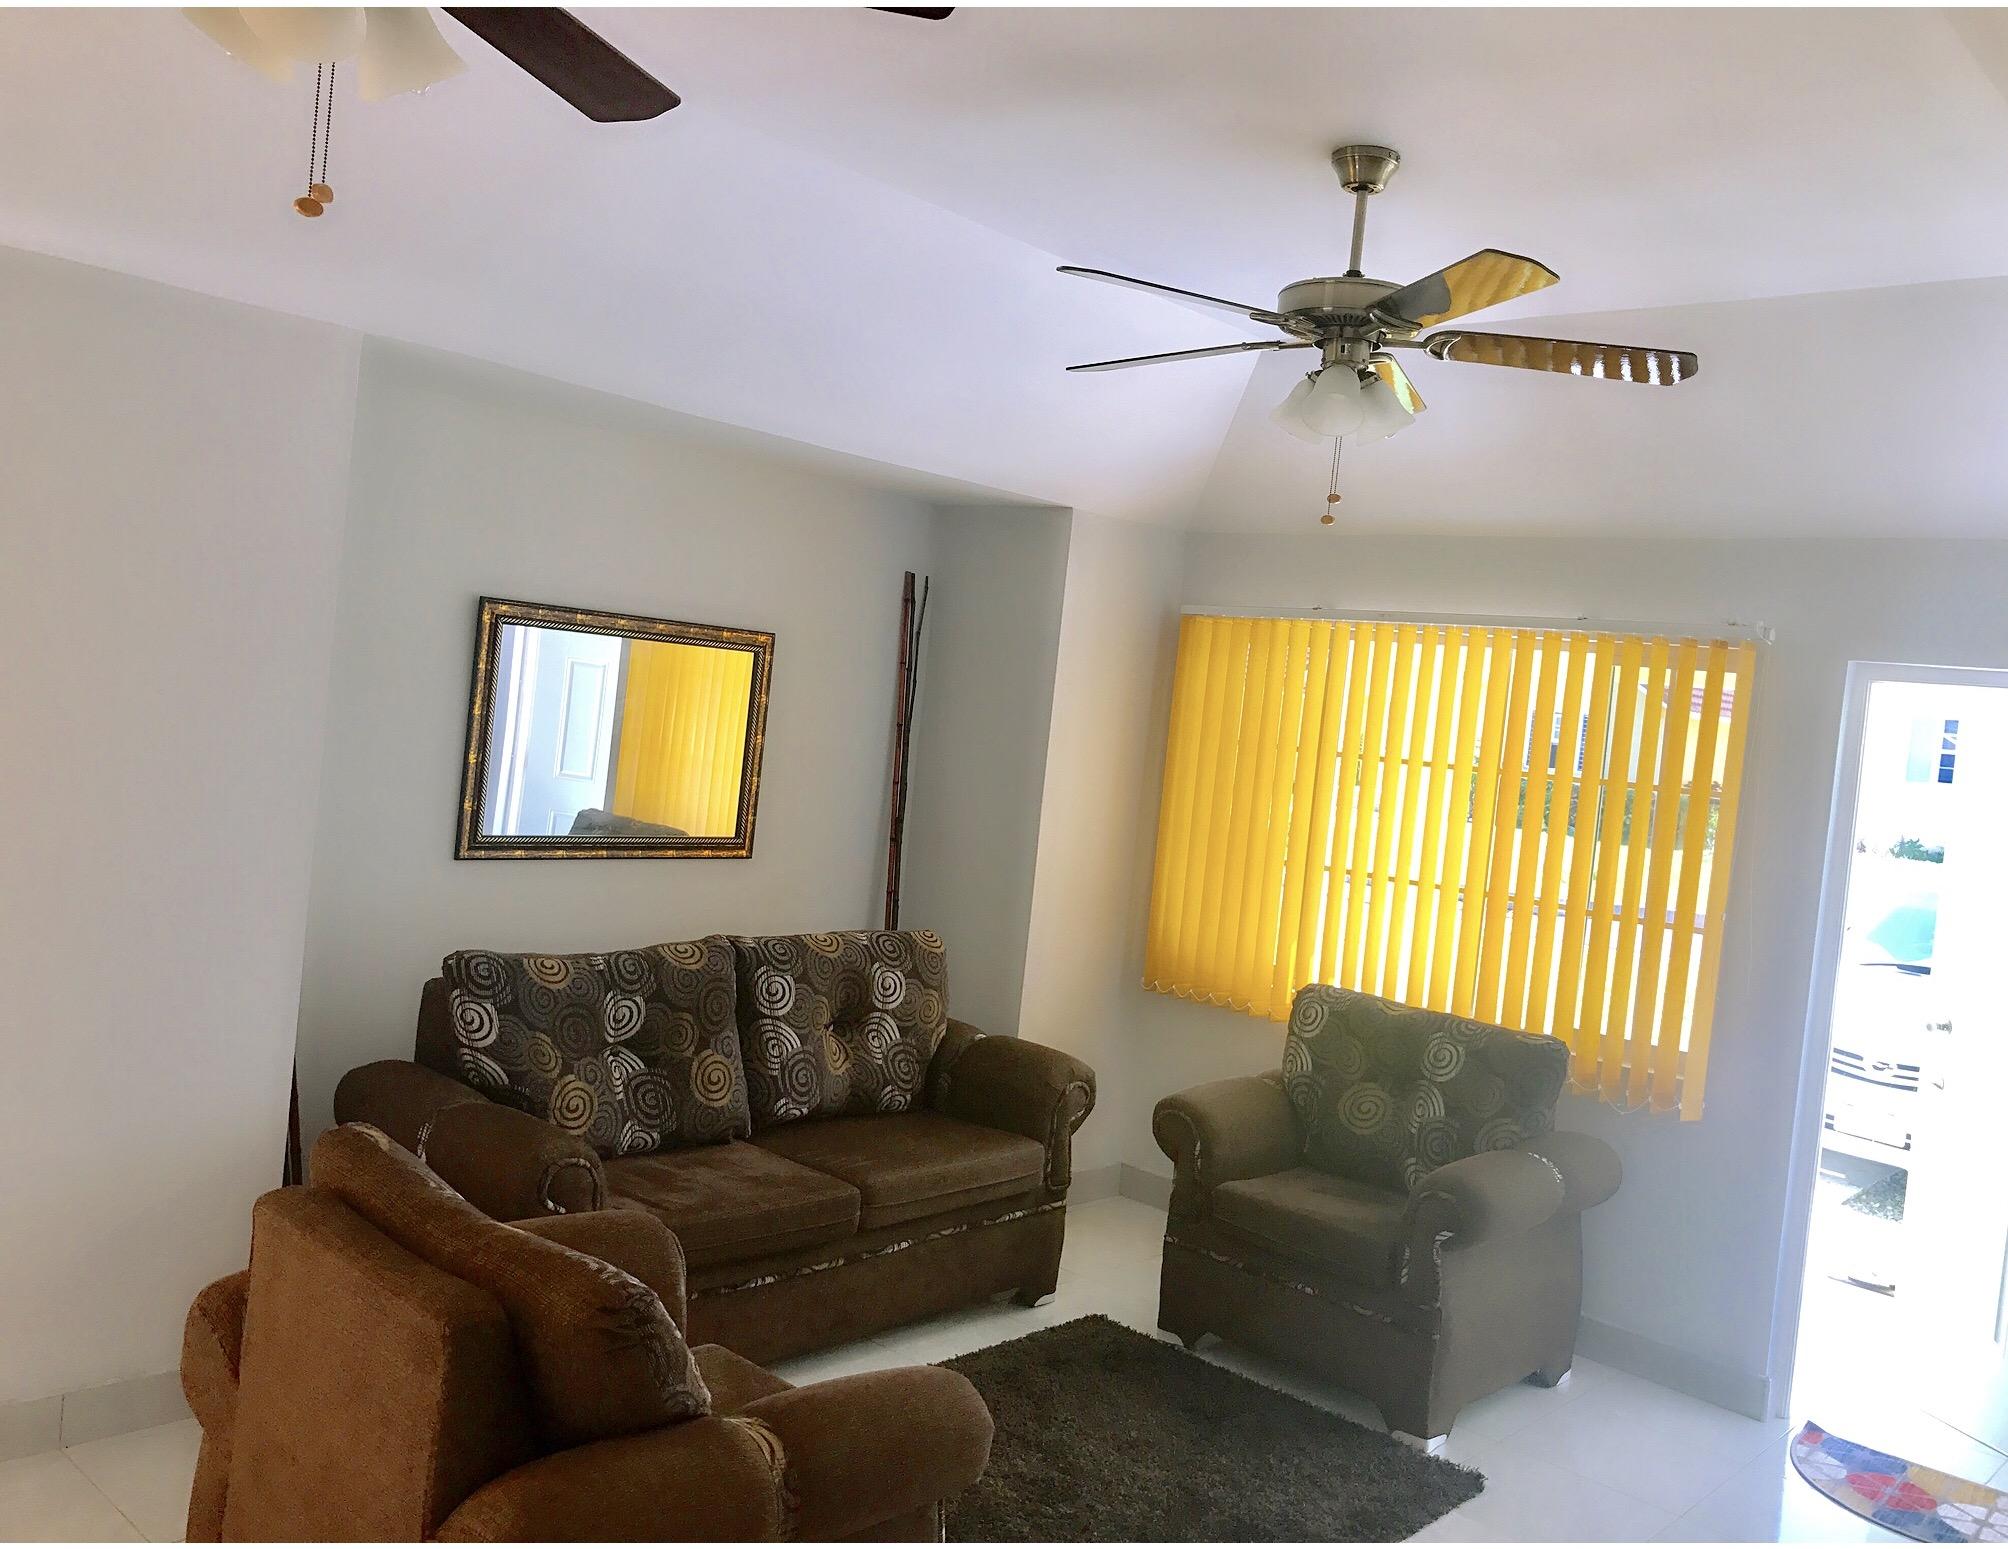 147 Hartland Estate Houses For Rent In Priory St Ann Parish Jamaica